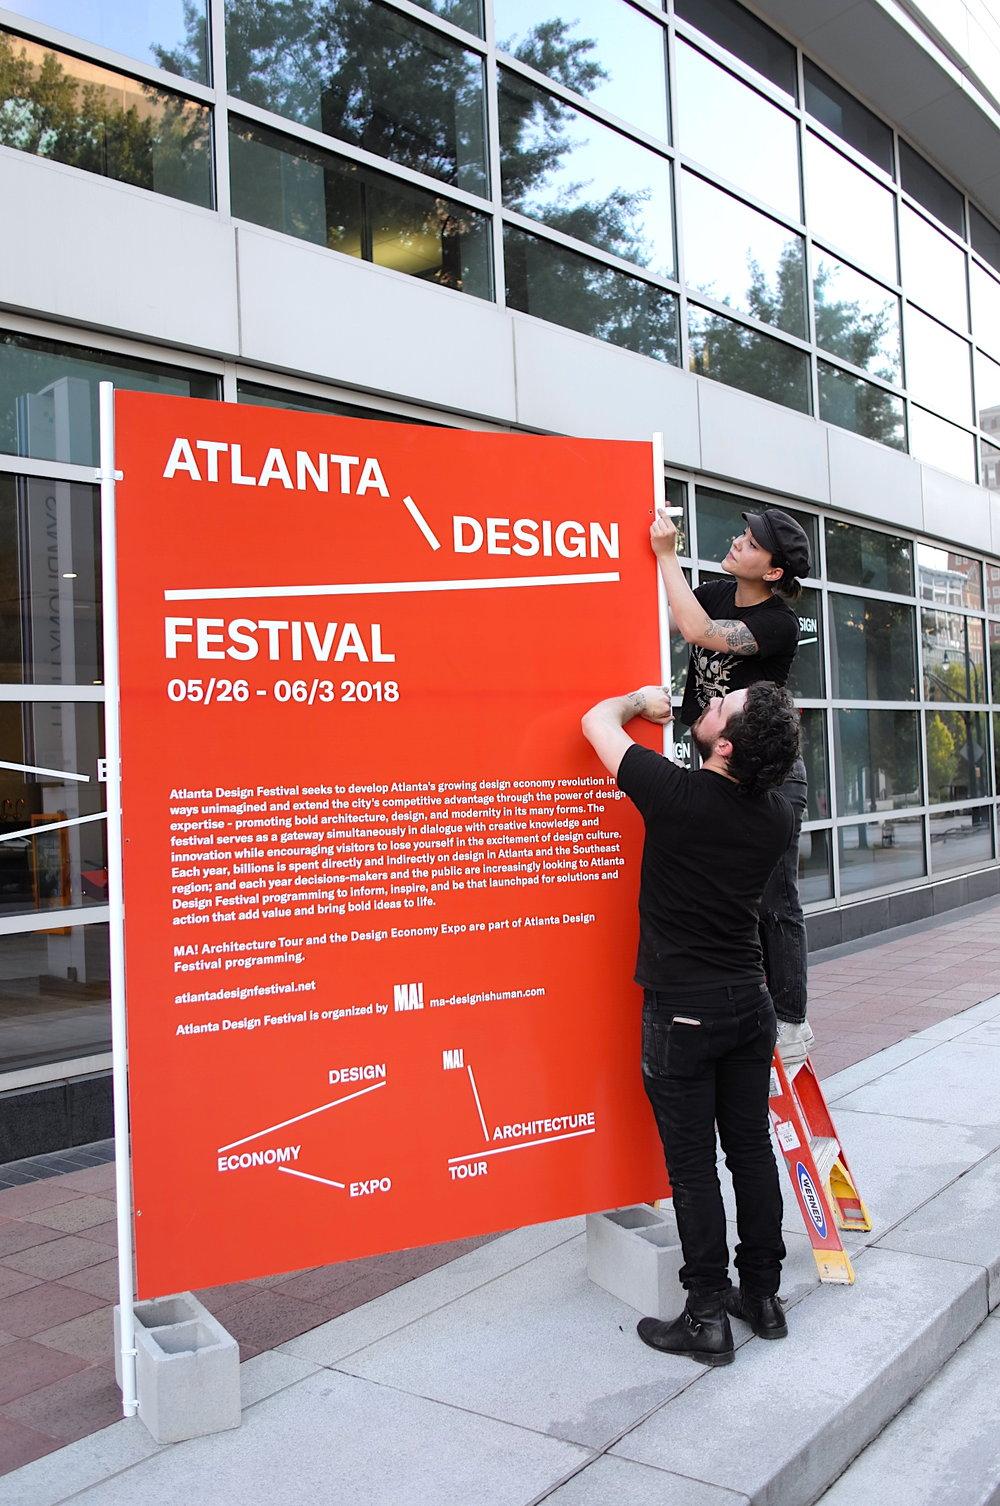 Studio-Verena-Hennig-Atlanta-Design-Festival-Branding-3.jpg